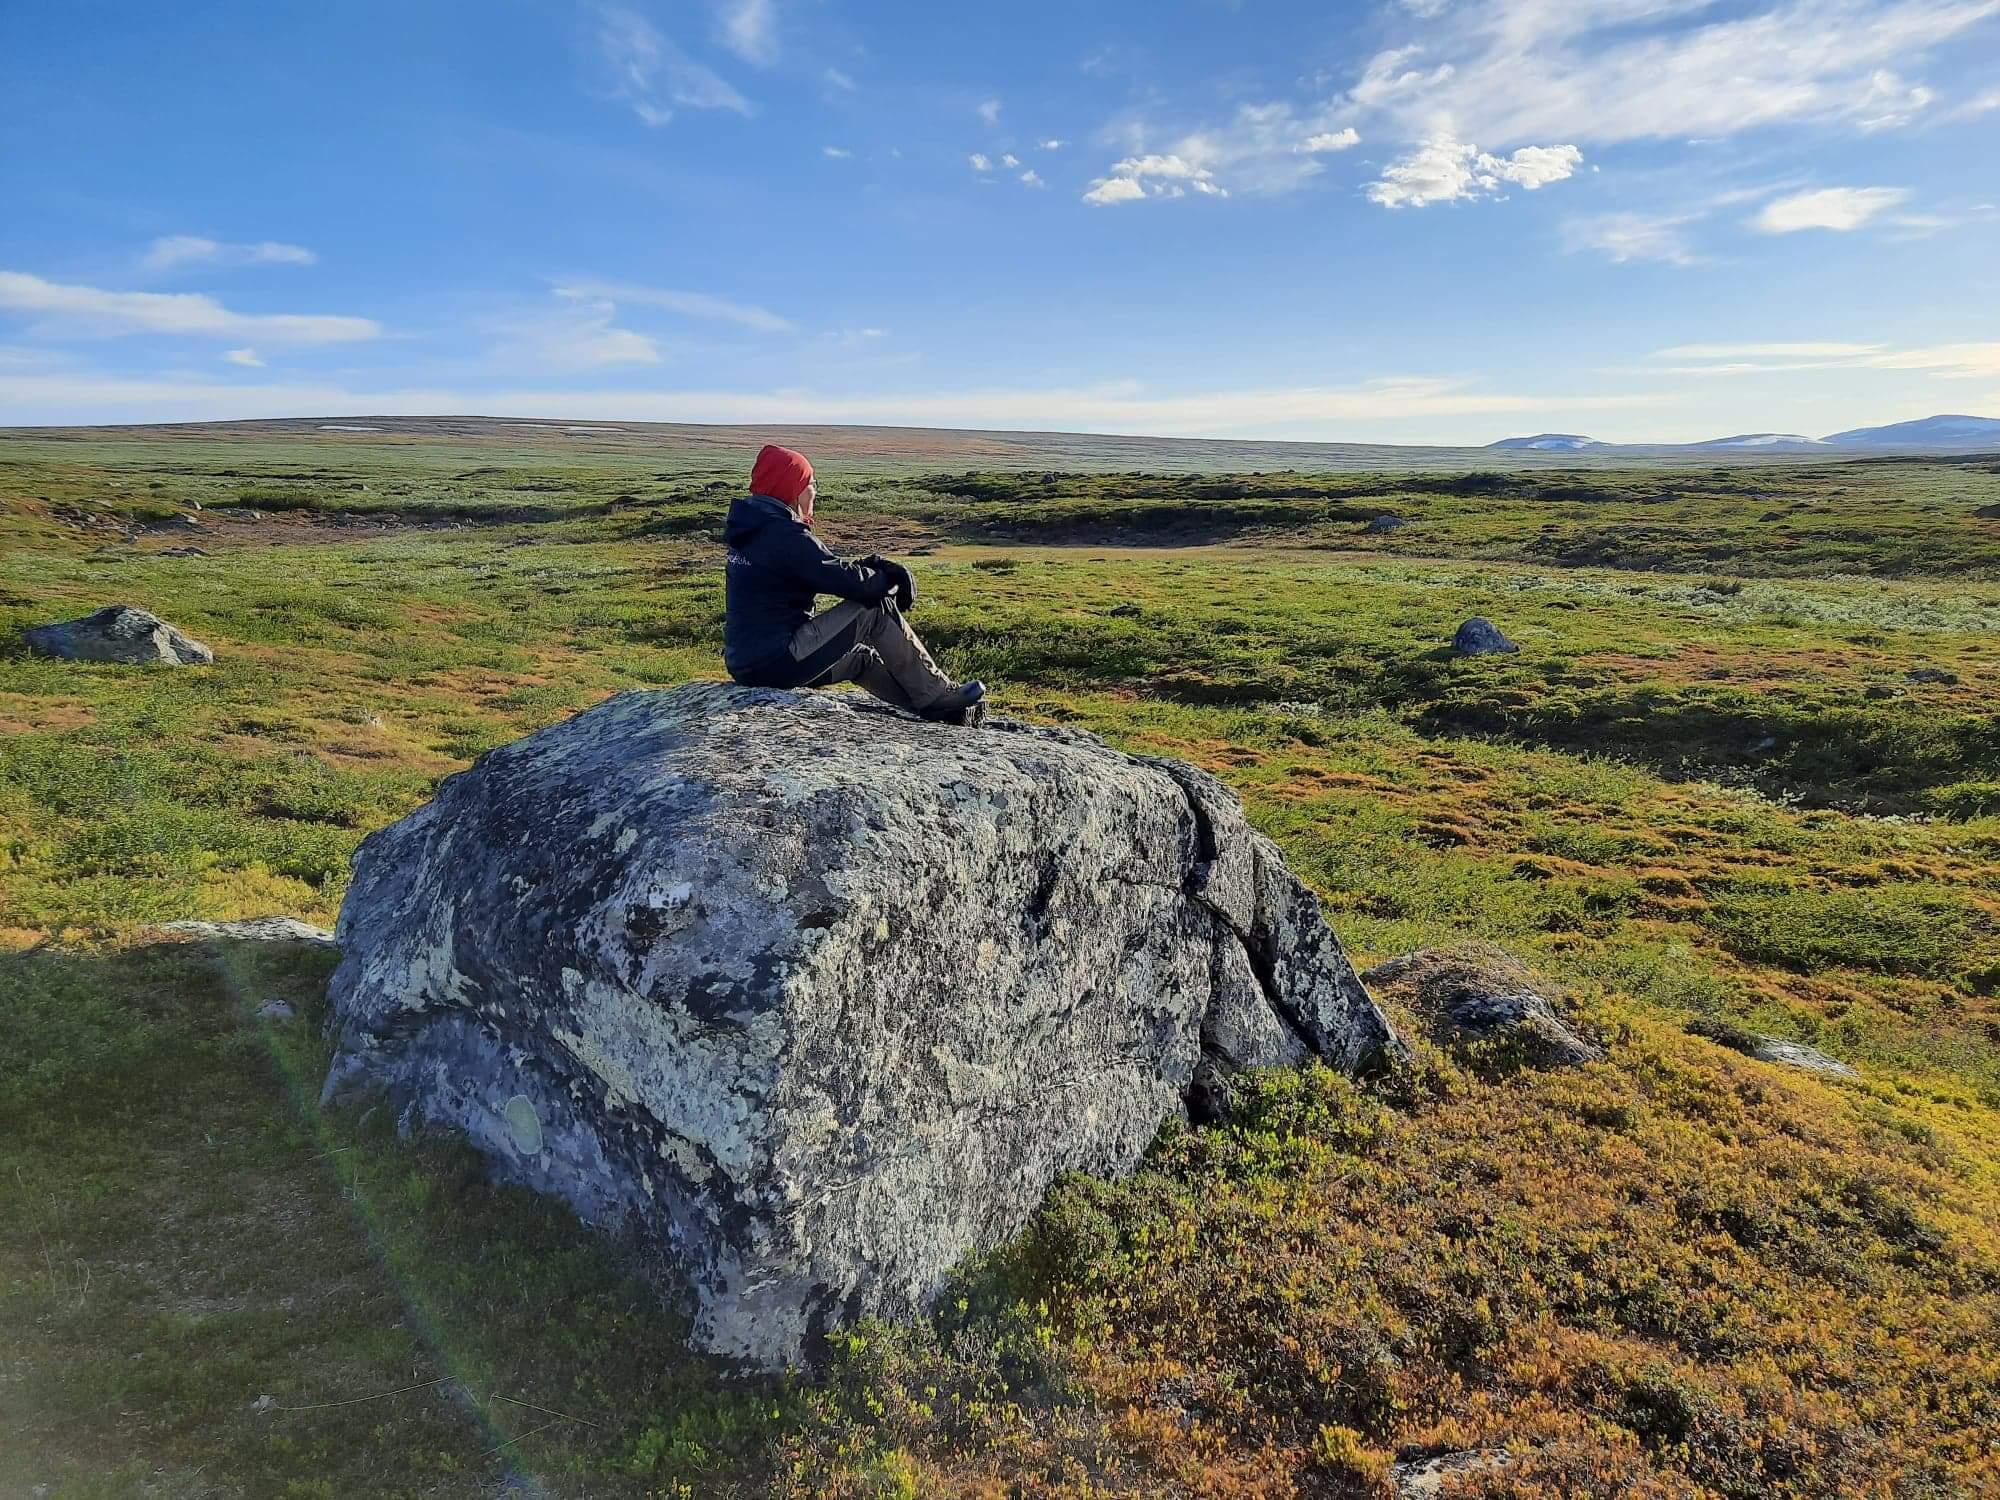 Natur utsikt i Lapland